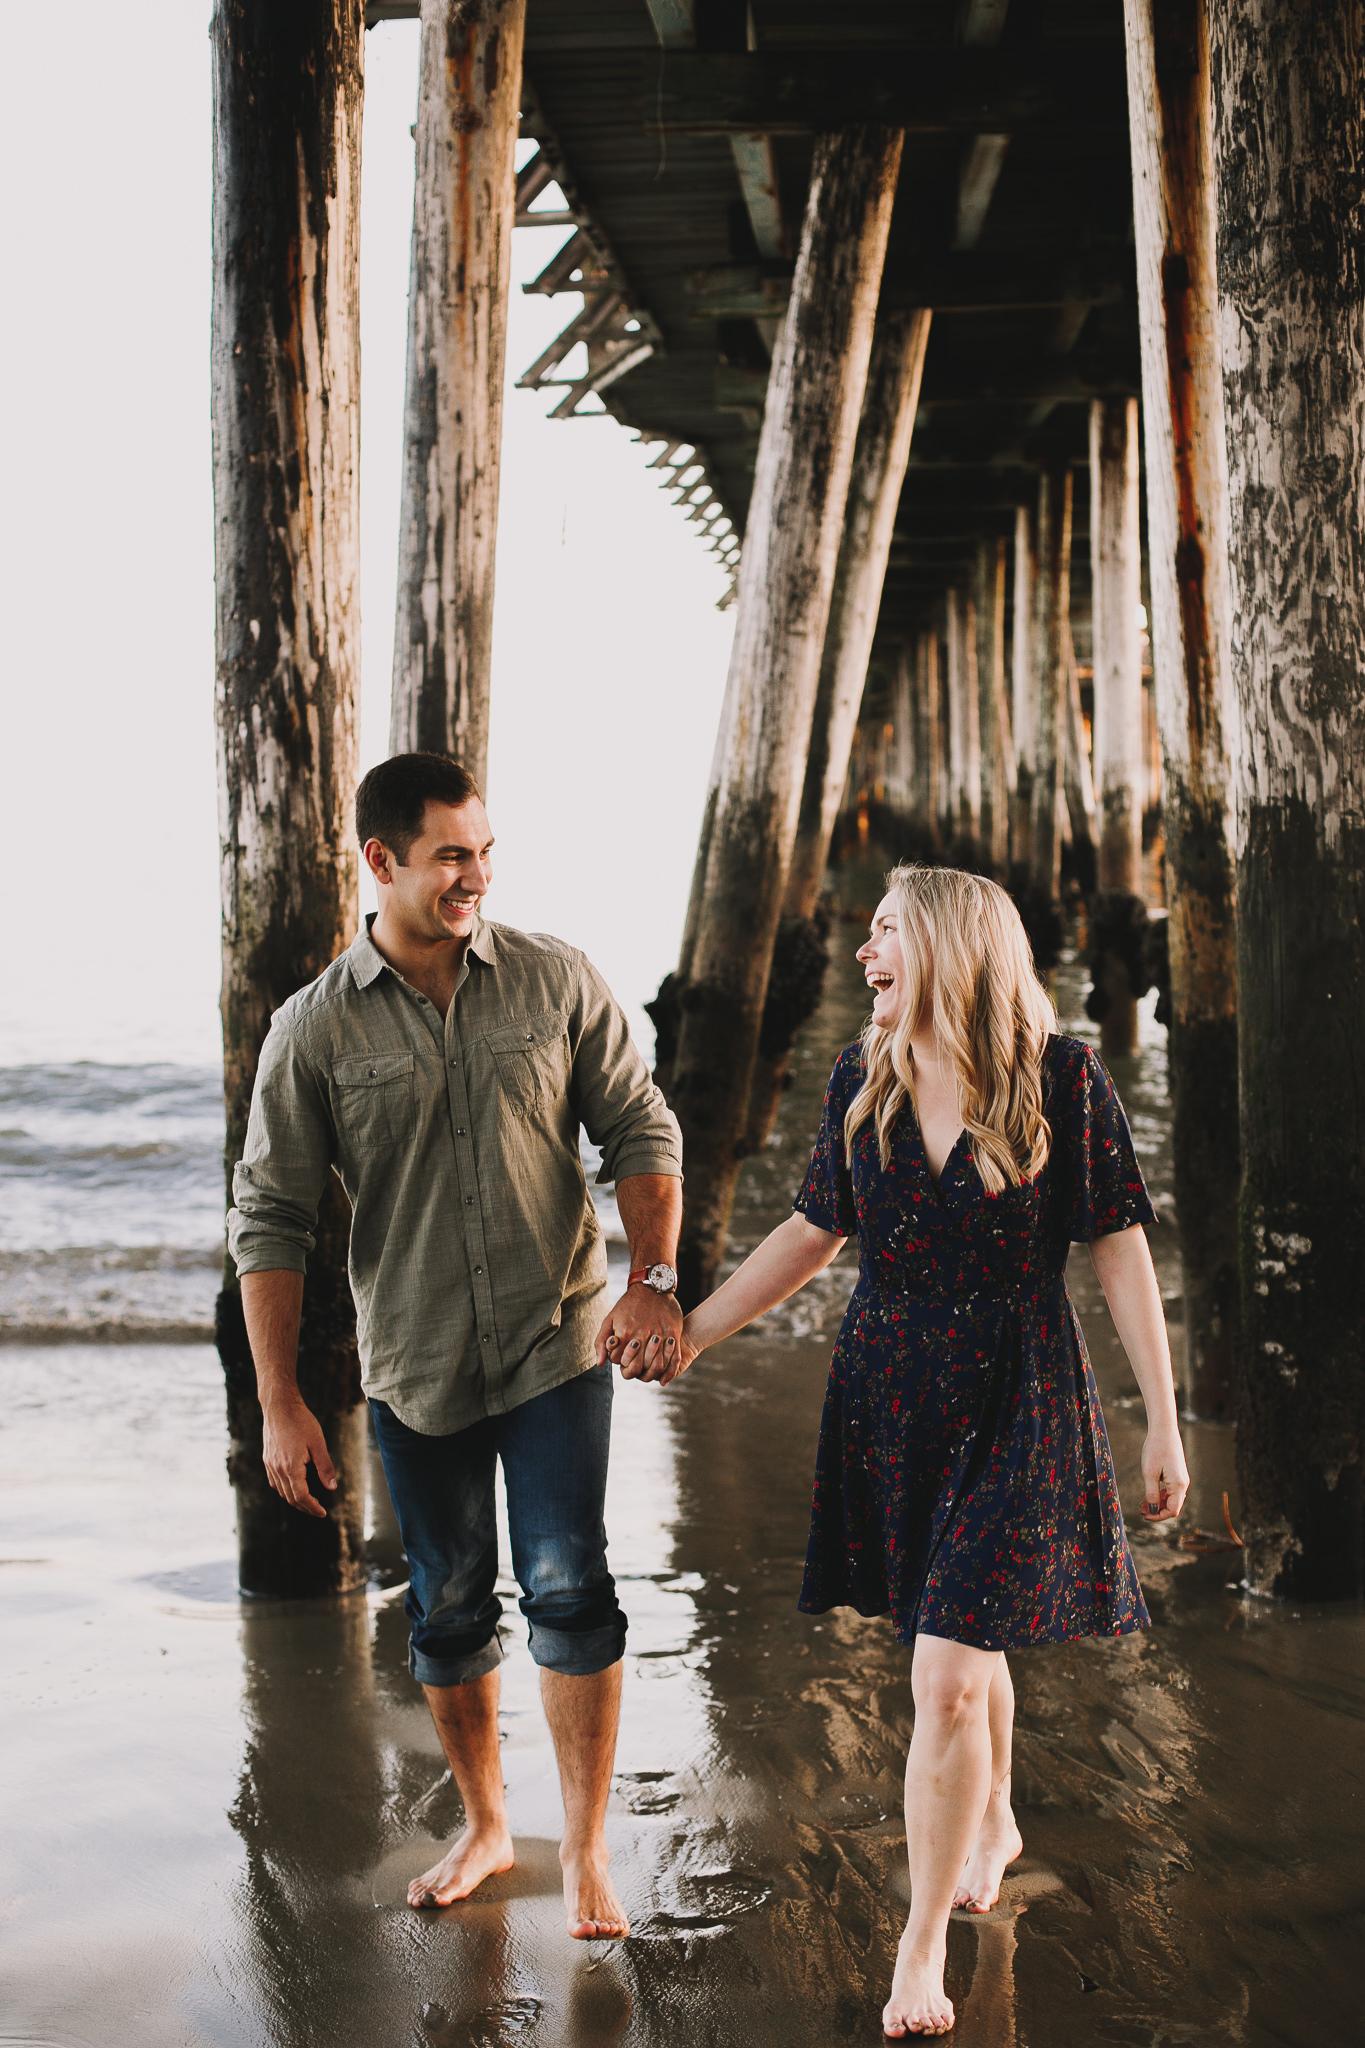 Archer Inspired Photography Capitola Beach Santa Cruz Wedding Engagement Lifestyle Session Photographer-126.jpg